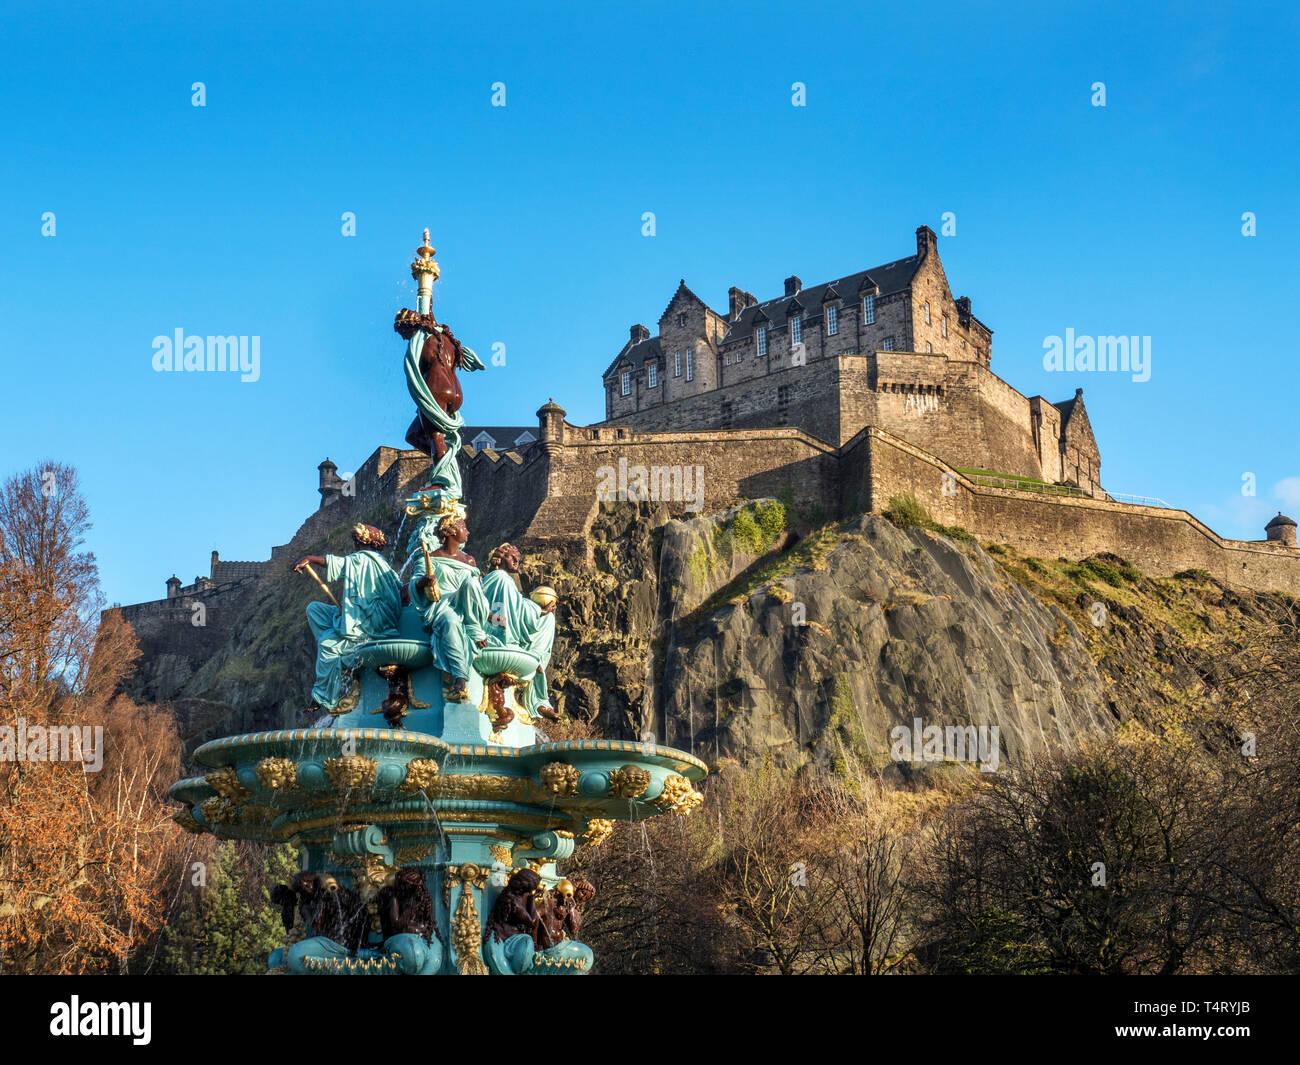 The Ross Fountain and Edinburgh Castle from West Princes Street Gardens Edinburgh Scotland - Stock Image